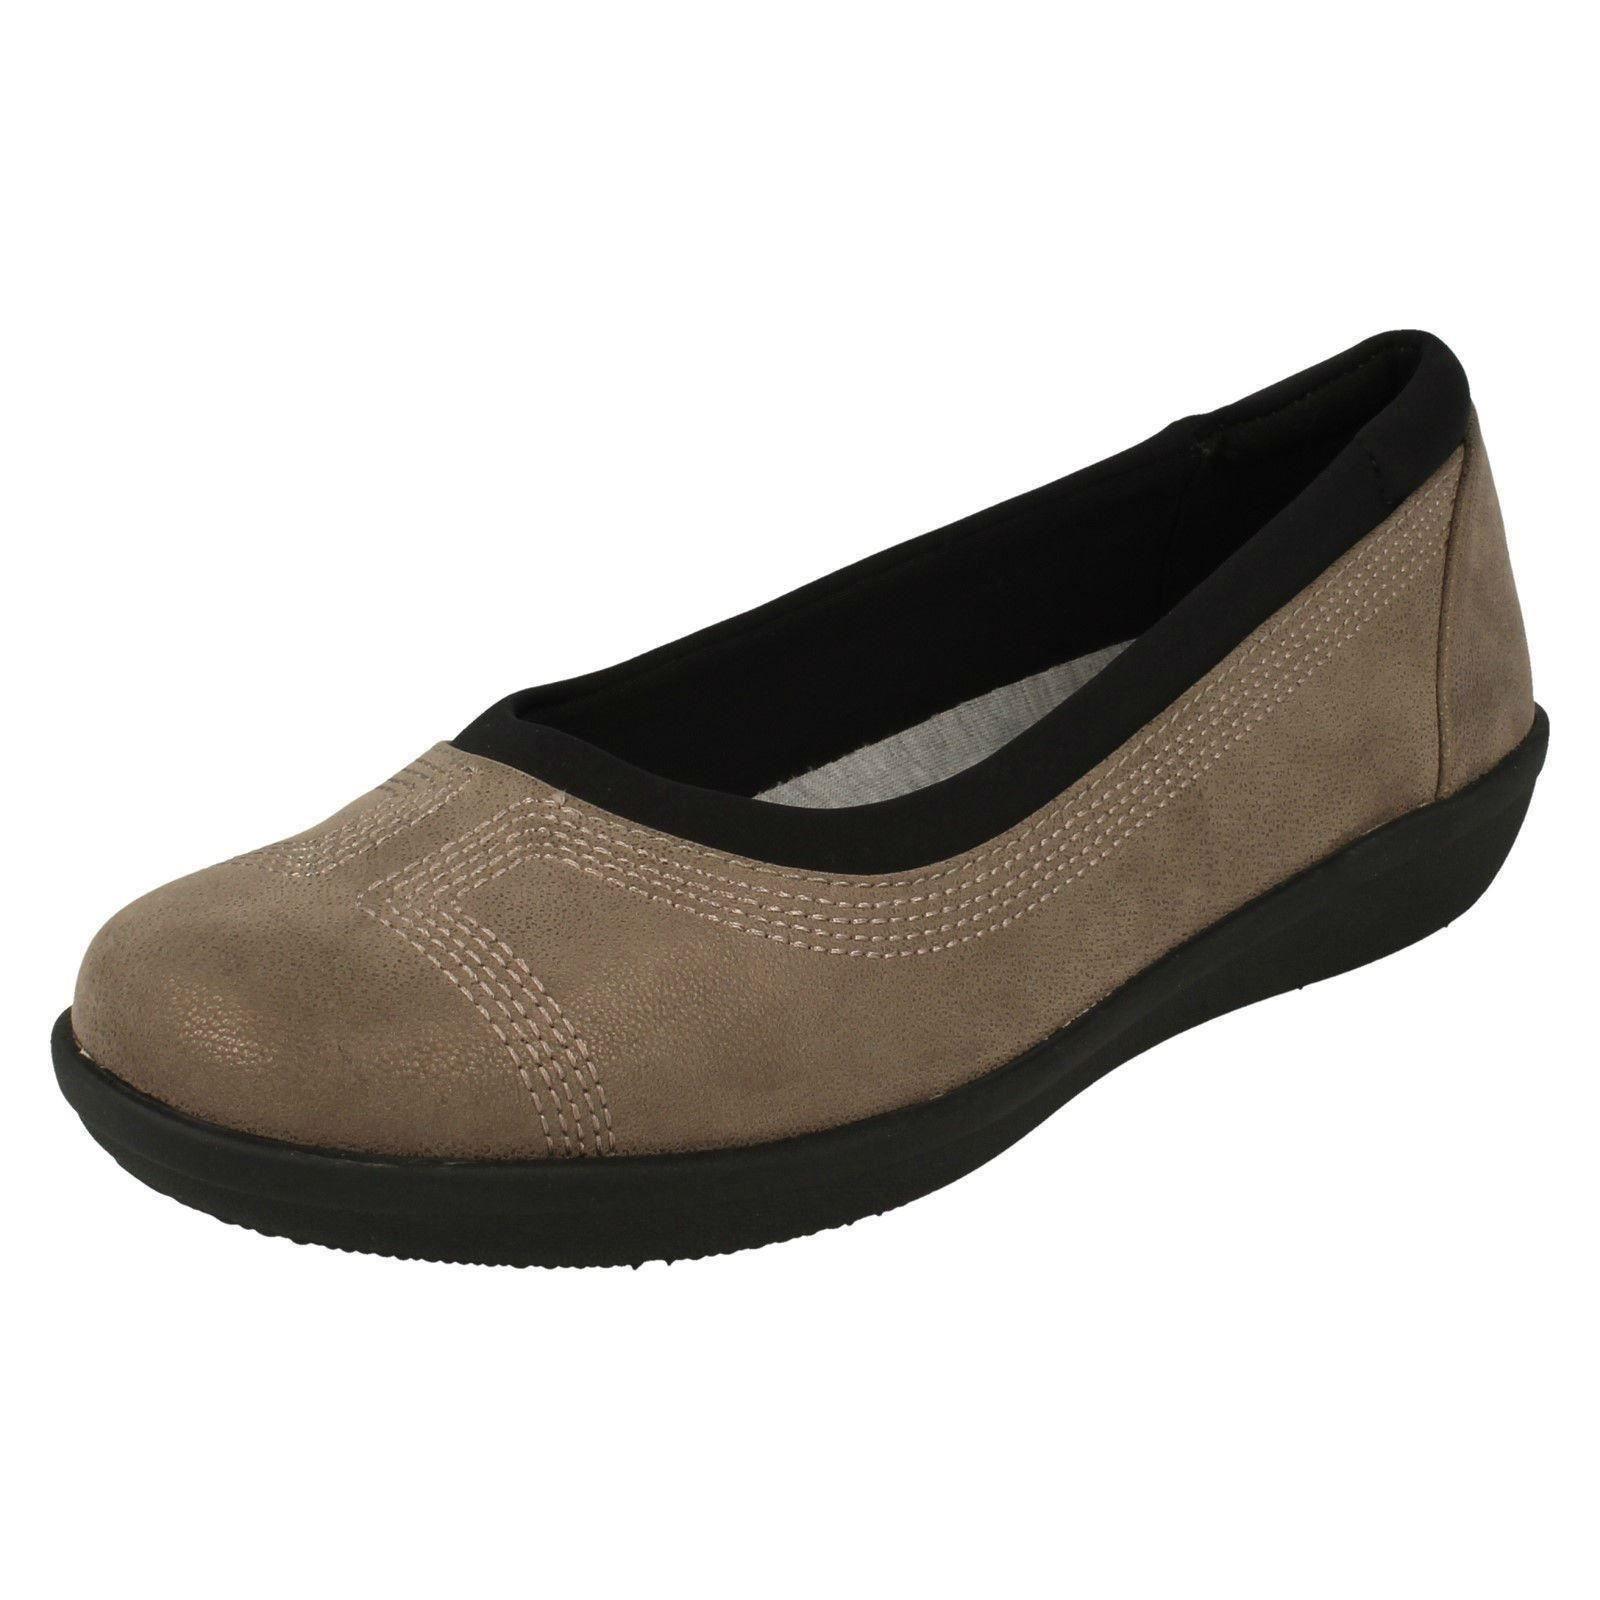 1c65df42 Women clarks flat walking cloud textile round toe shoes - 'ayla' low ...